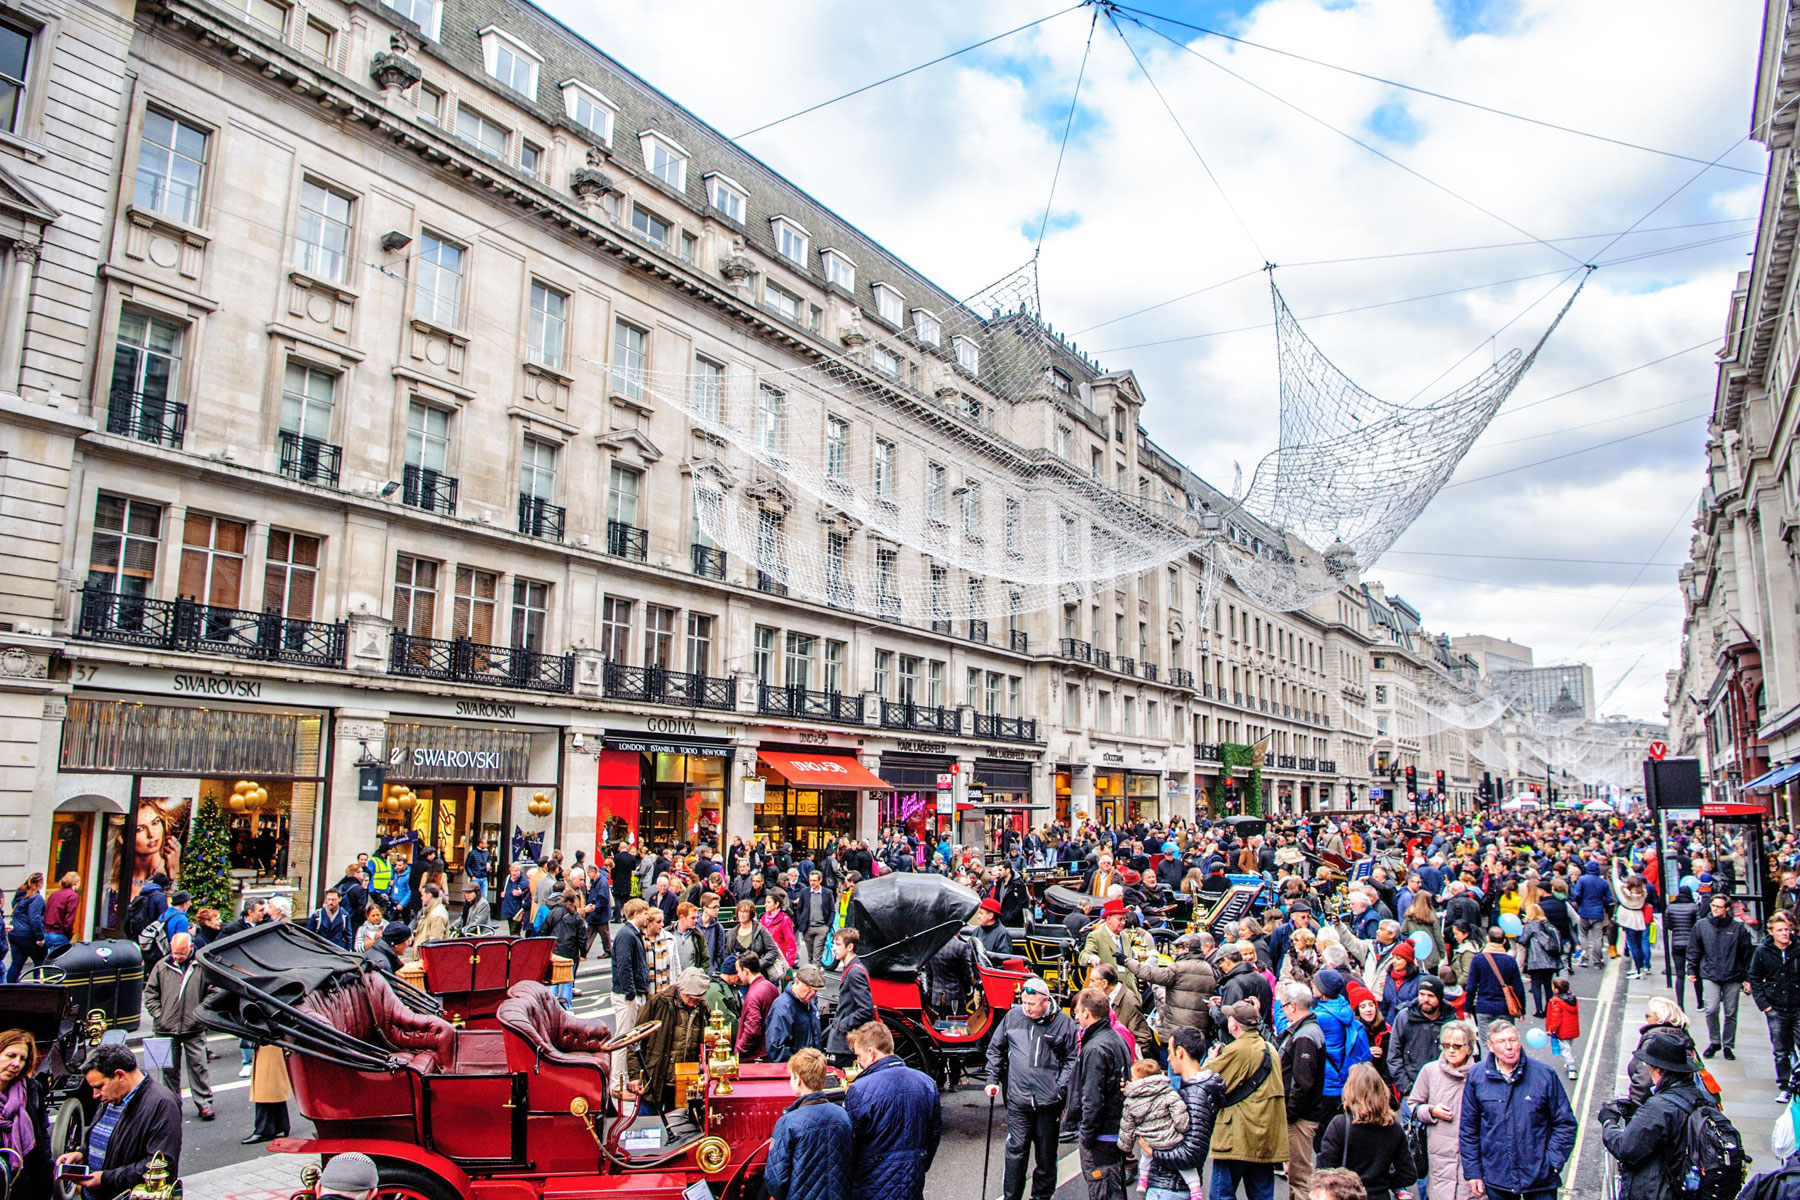 regent-street-crowds